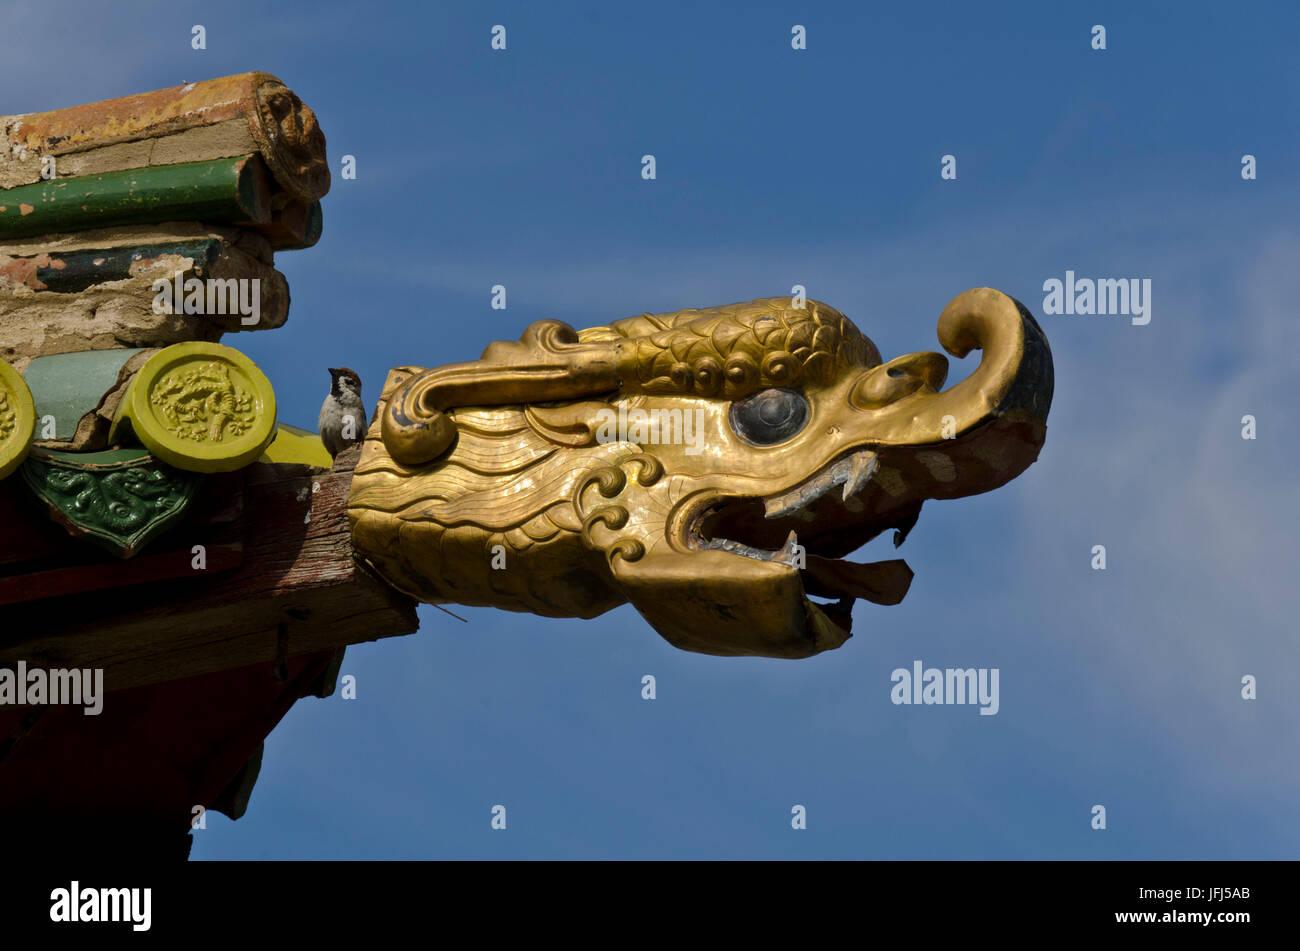 Mongolia, Central Asia, Karakorum / Qara Qorum, cloister of Erdene Zuu, capital of Genghis Khan - Stock Image